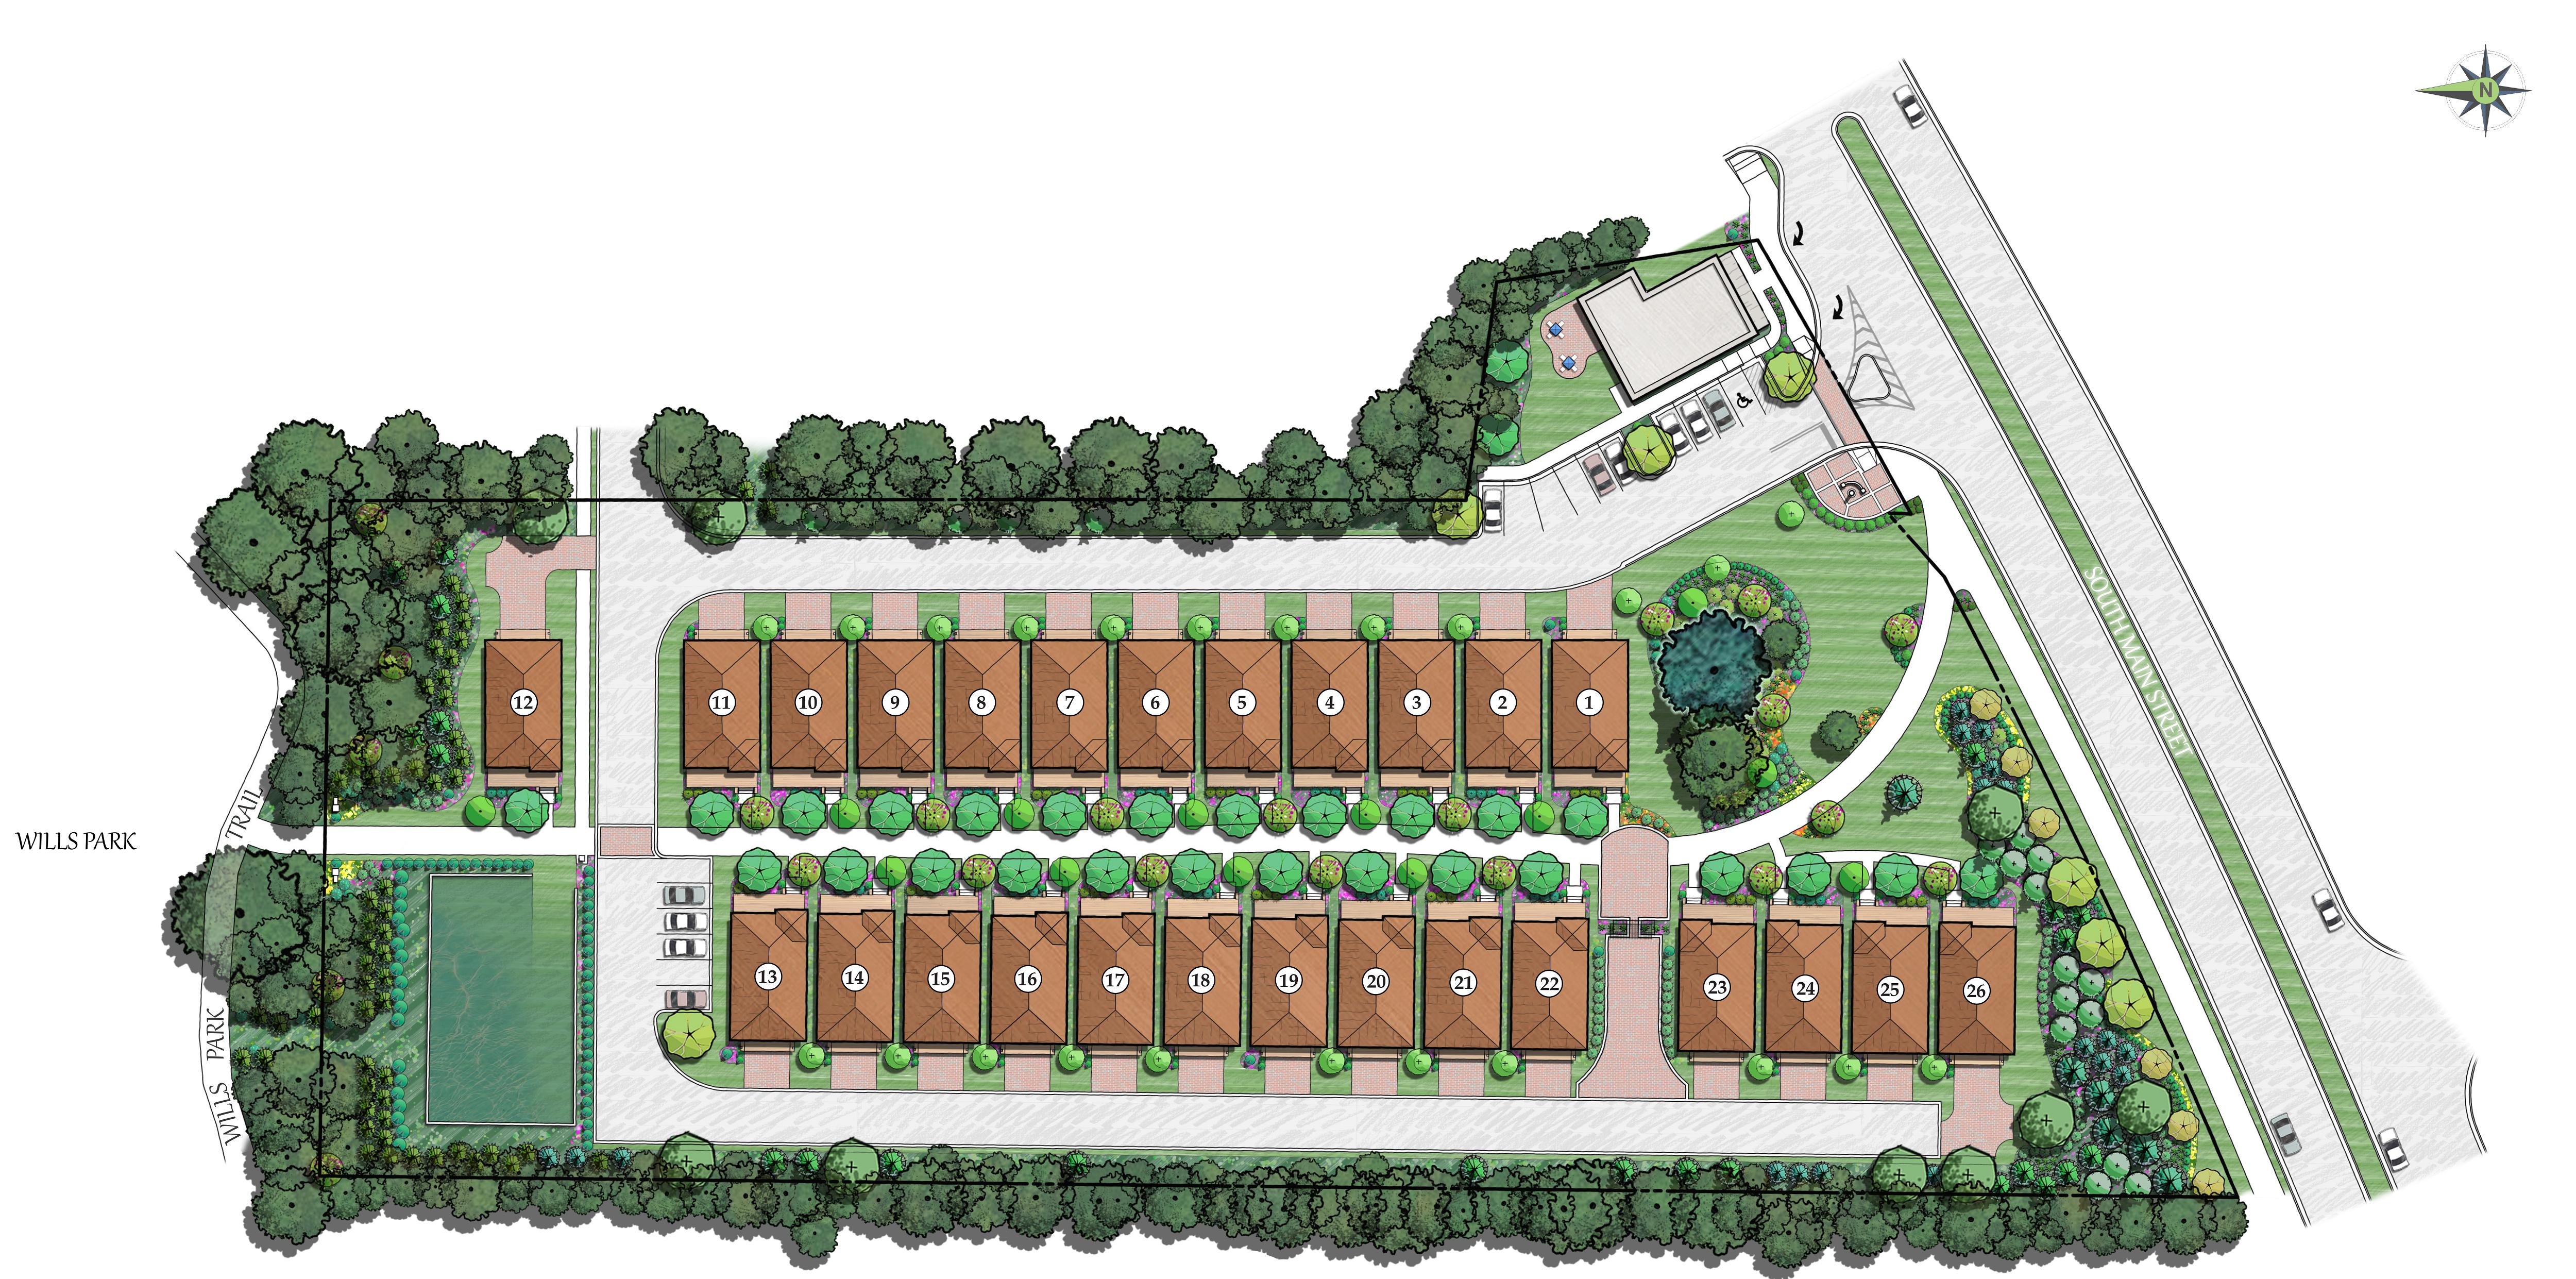 Magnolia Residential Properties Announces New Alpharetta Community